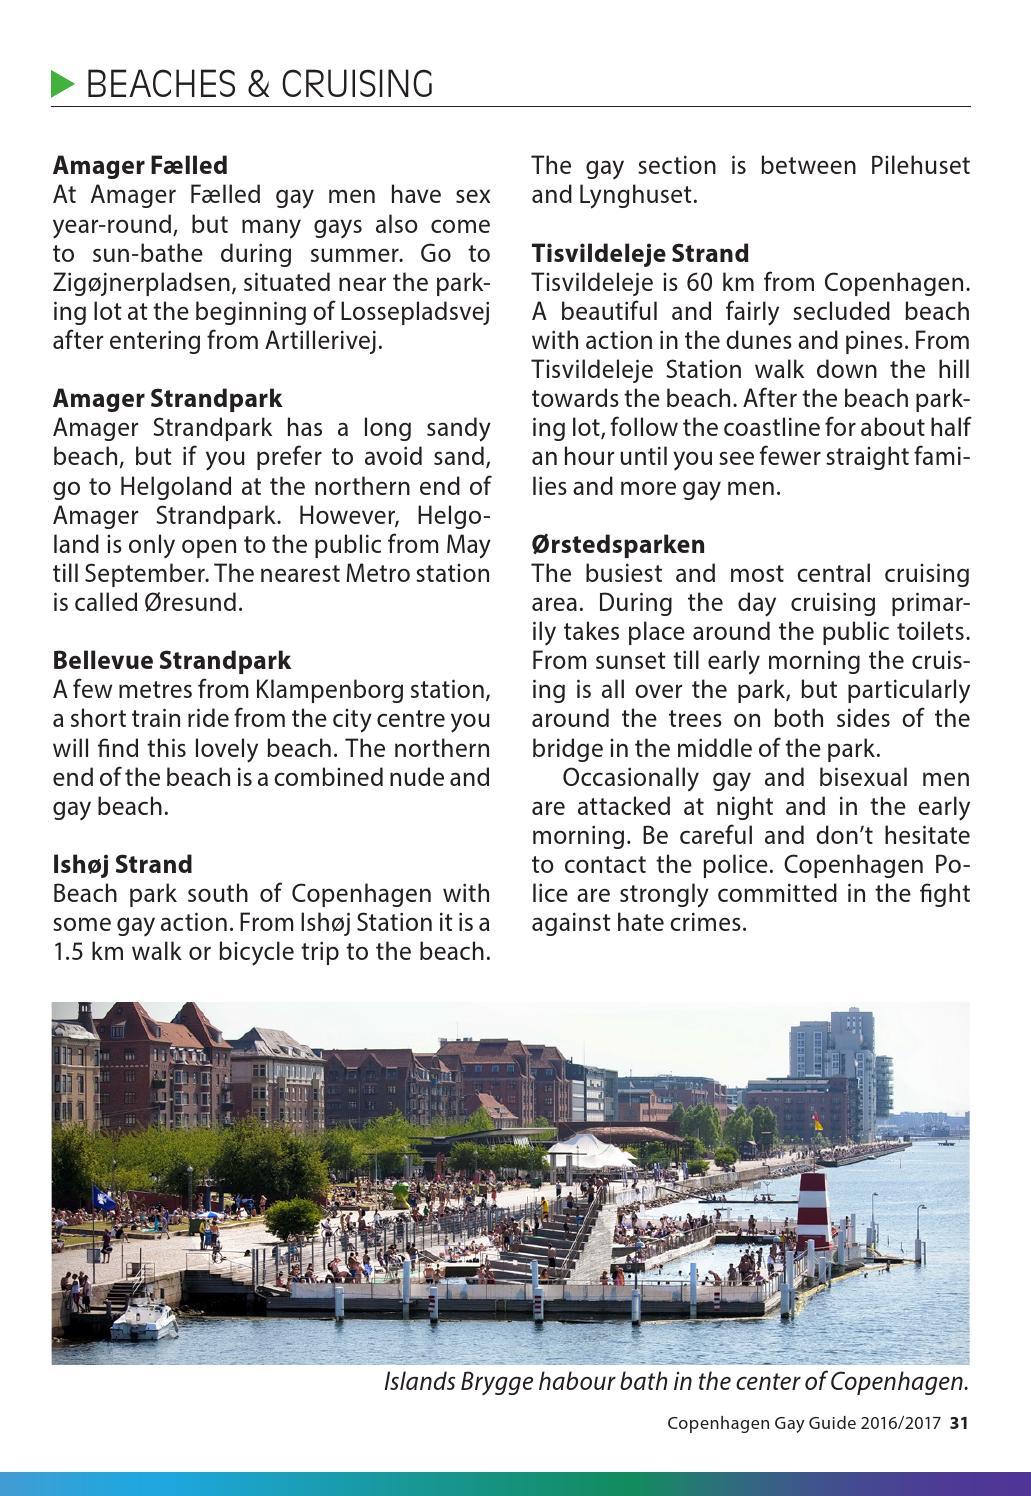 Copenhagen Gay Guide 17 by Rainbow Business Denmark - Issuu